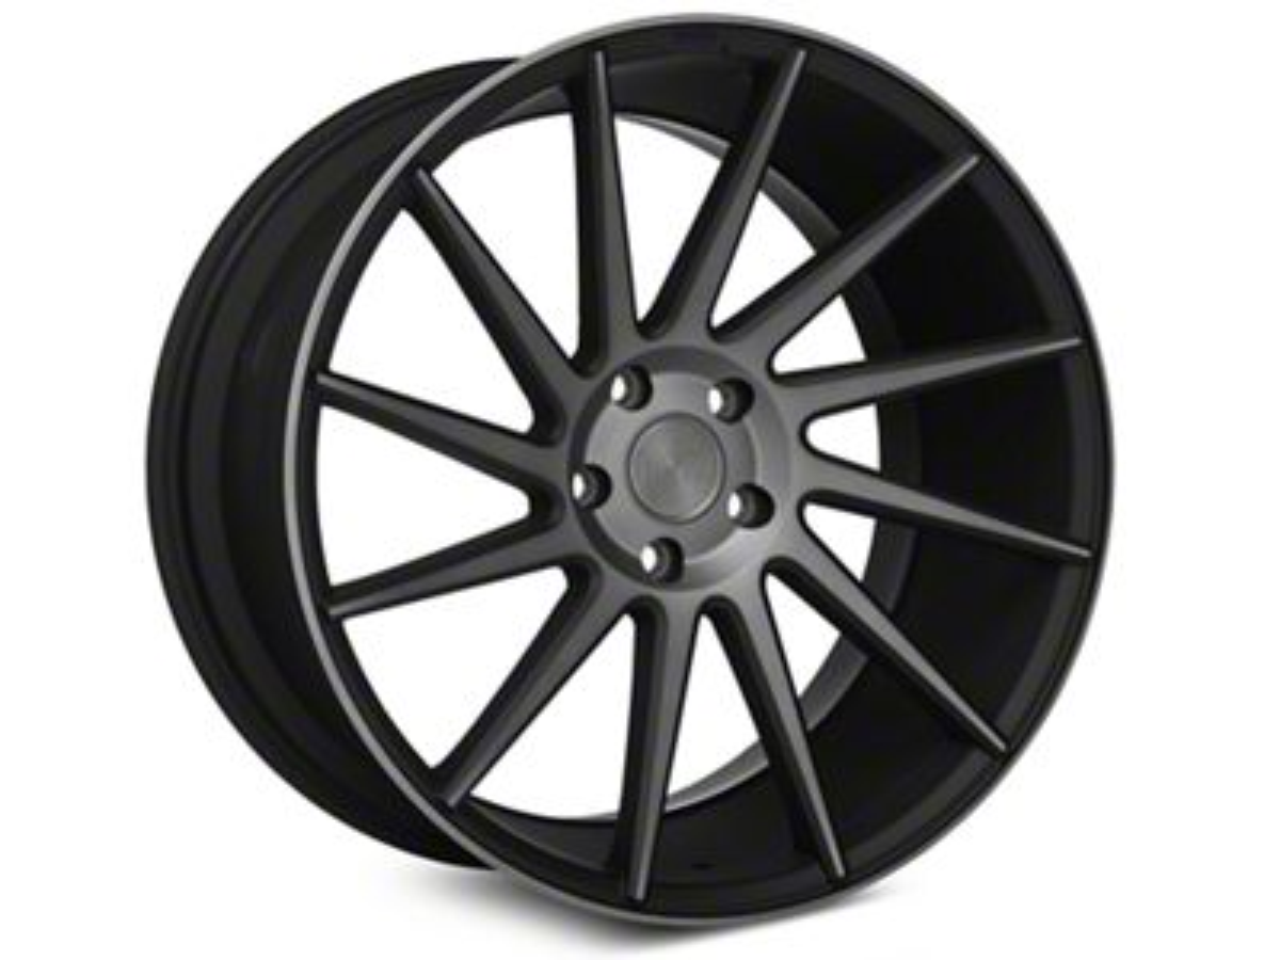 Niche Surge Double Dark Directional Wheel - Driver Side - 20x8.5 (05-14 All)